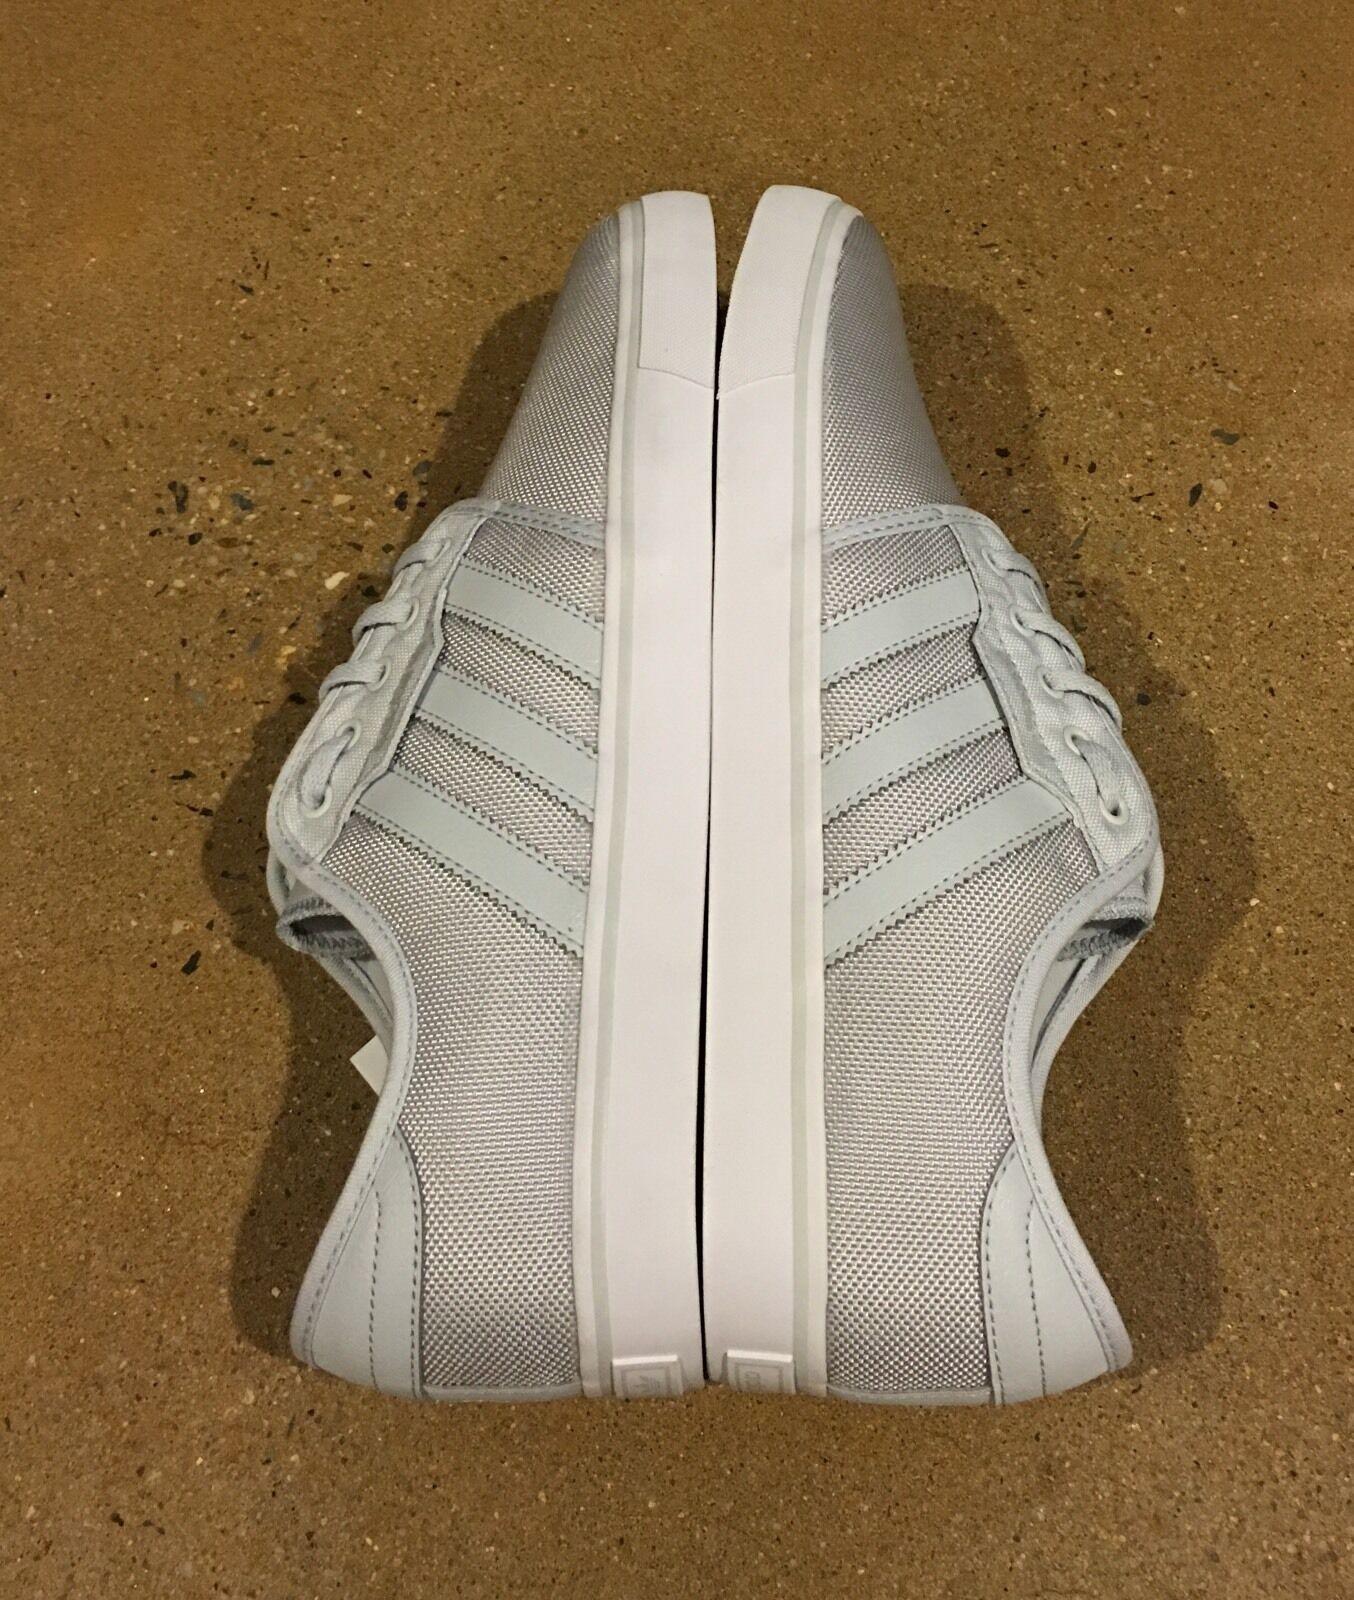 Adidas seeley taglia dc 12 noi grey bmx dc taglia skateboard scarpe da ginnastica 21d611